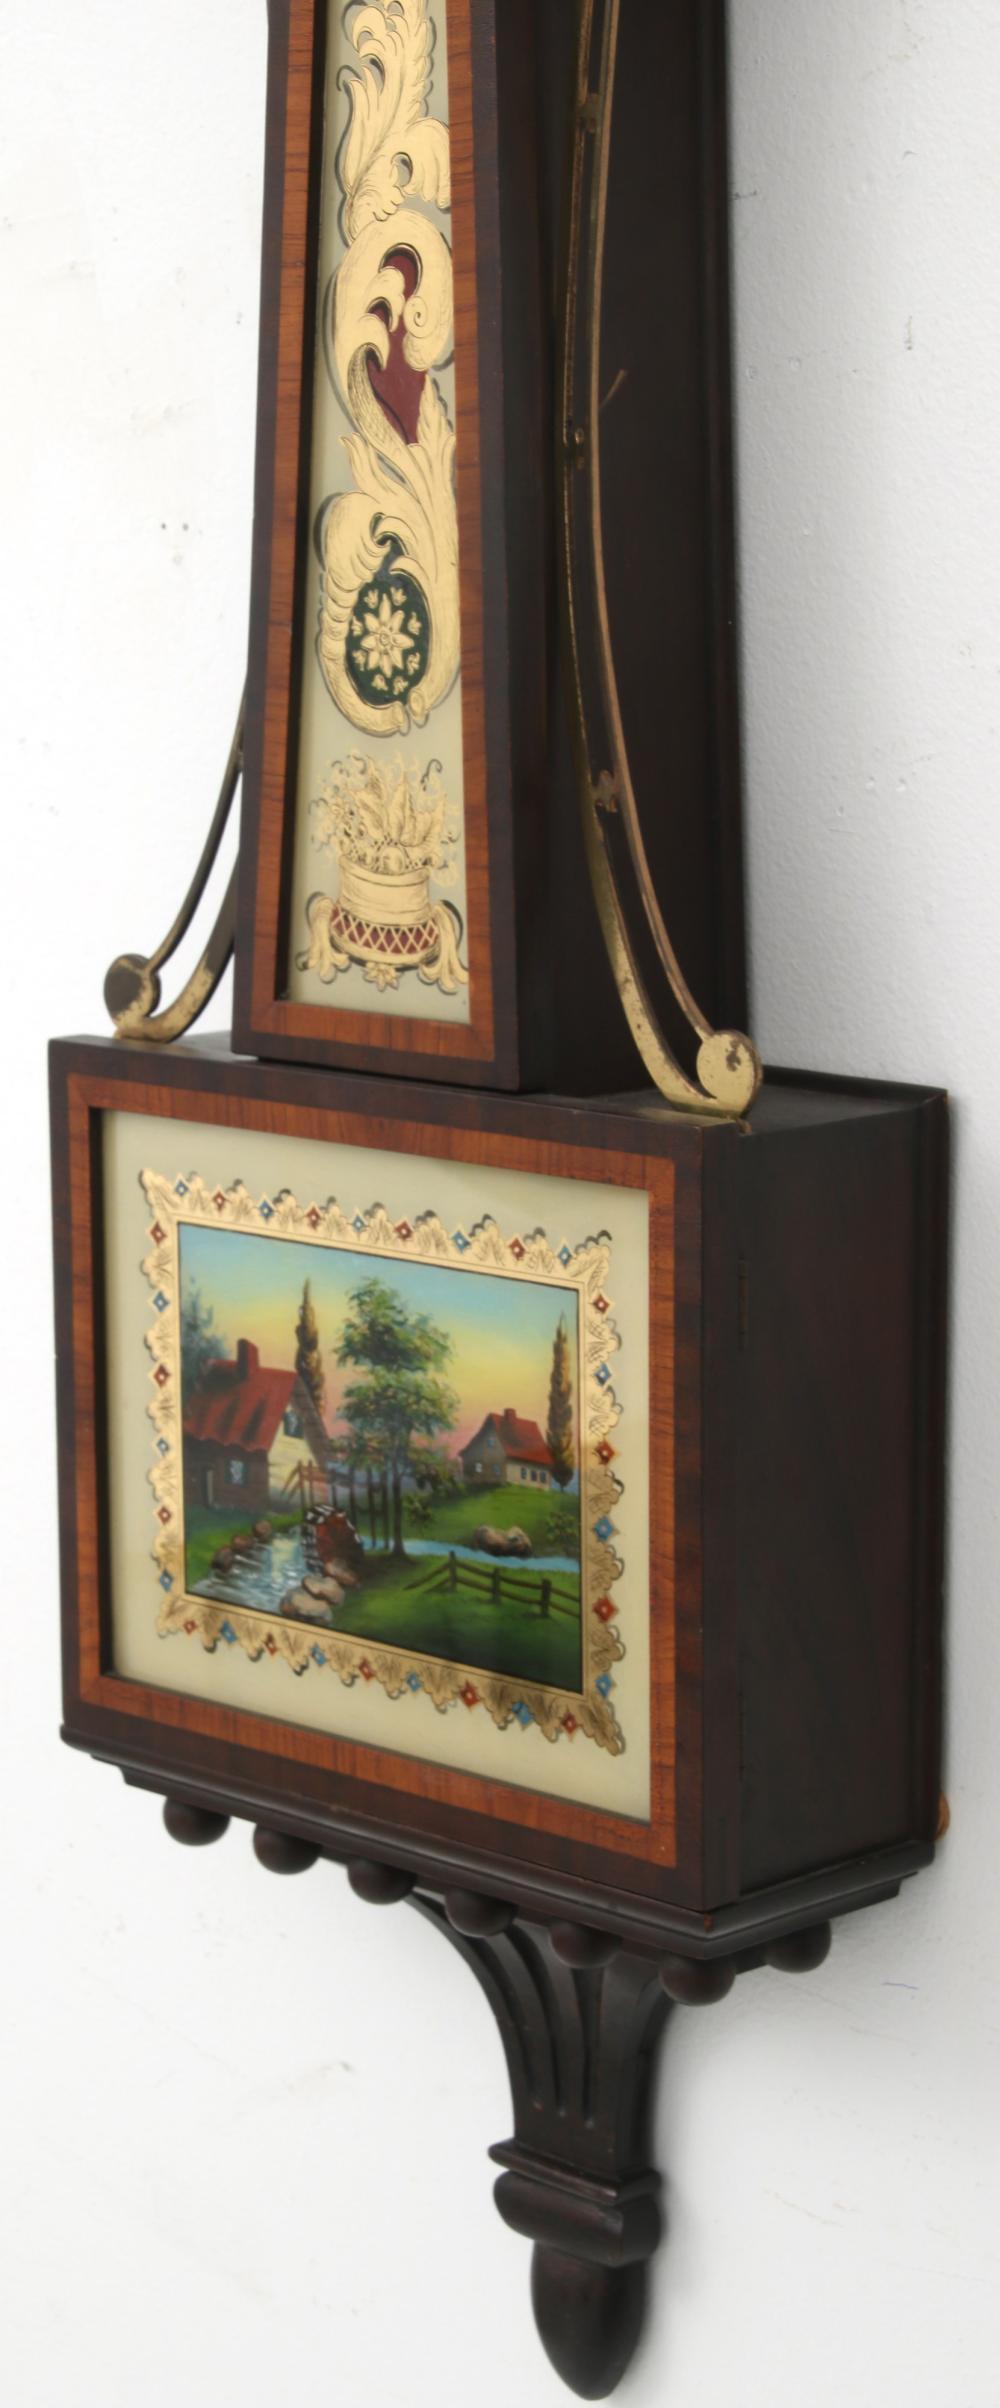 Waltham Presentation Banjo Clock